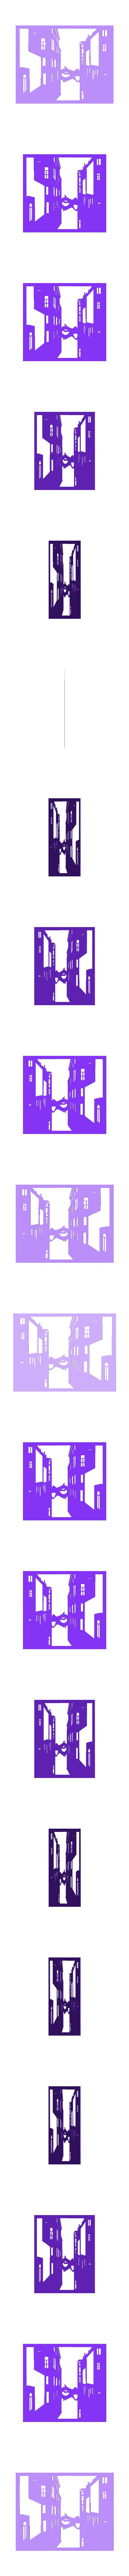 venecia4.STL Download free STL file lightbox venice • 3D printer template, gaevskiiy